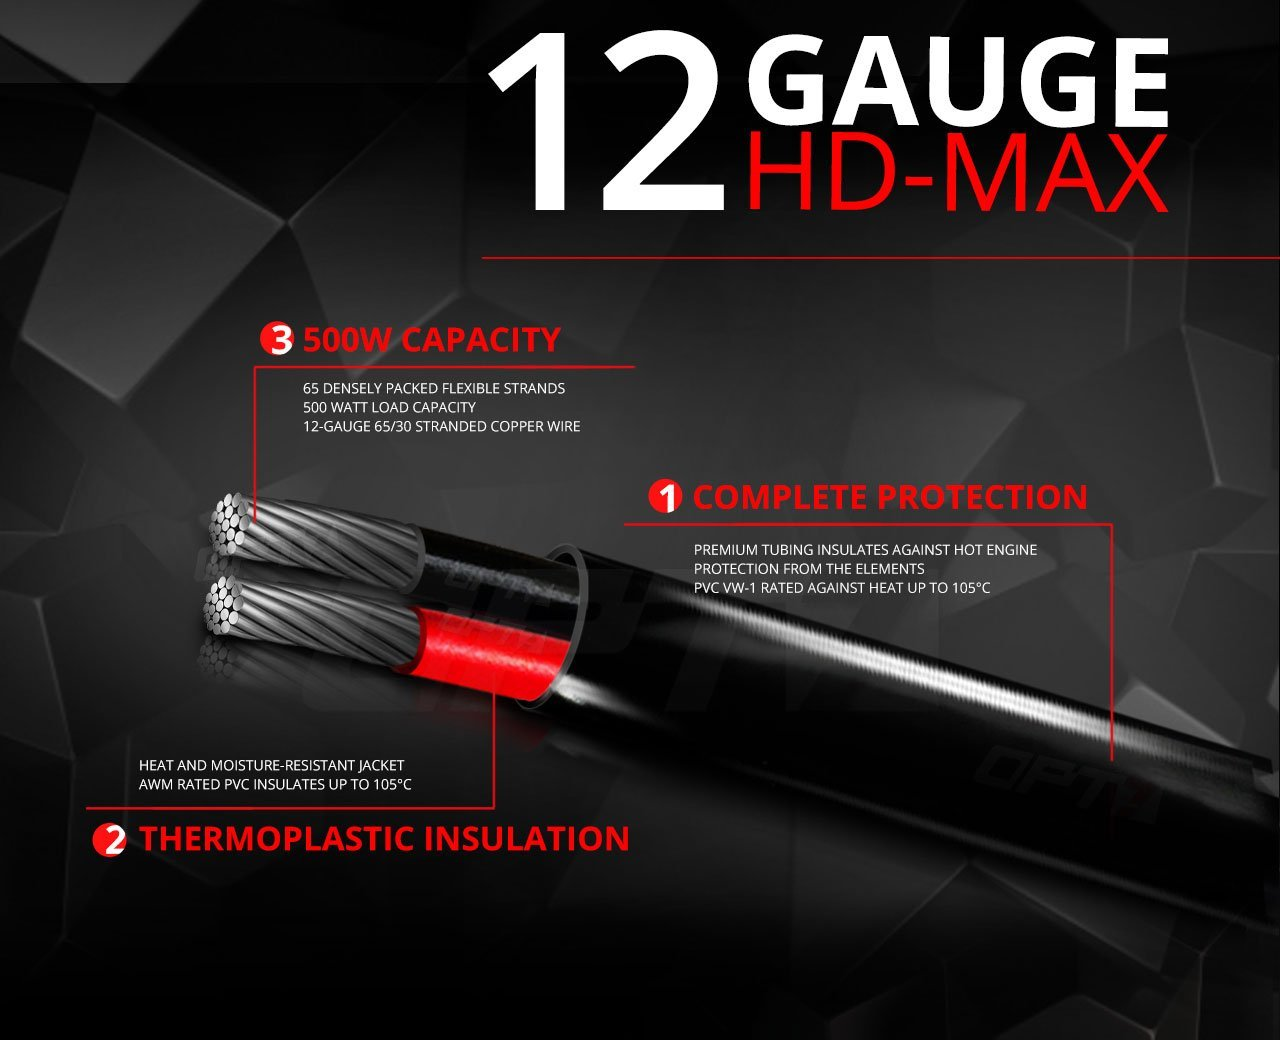 hdmax-led-bar-harness-2.jpg